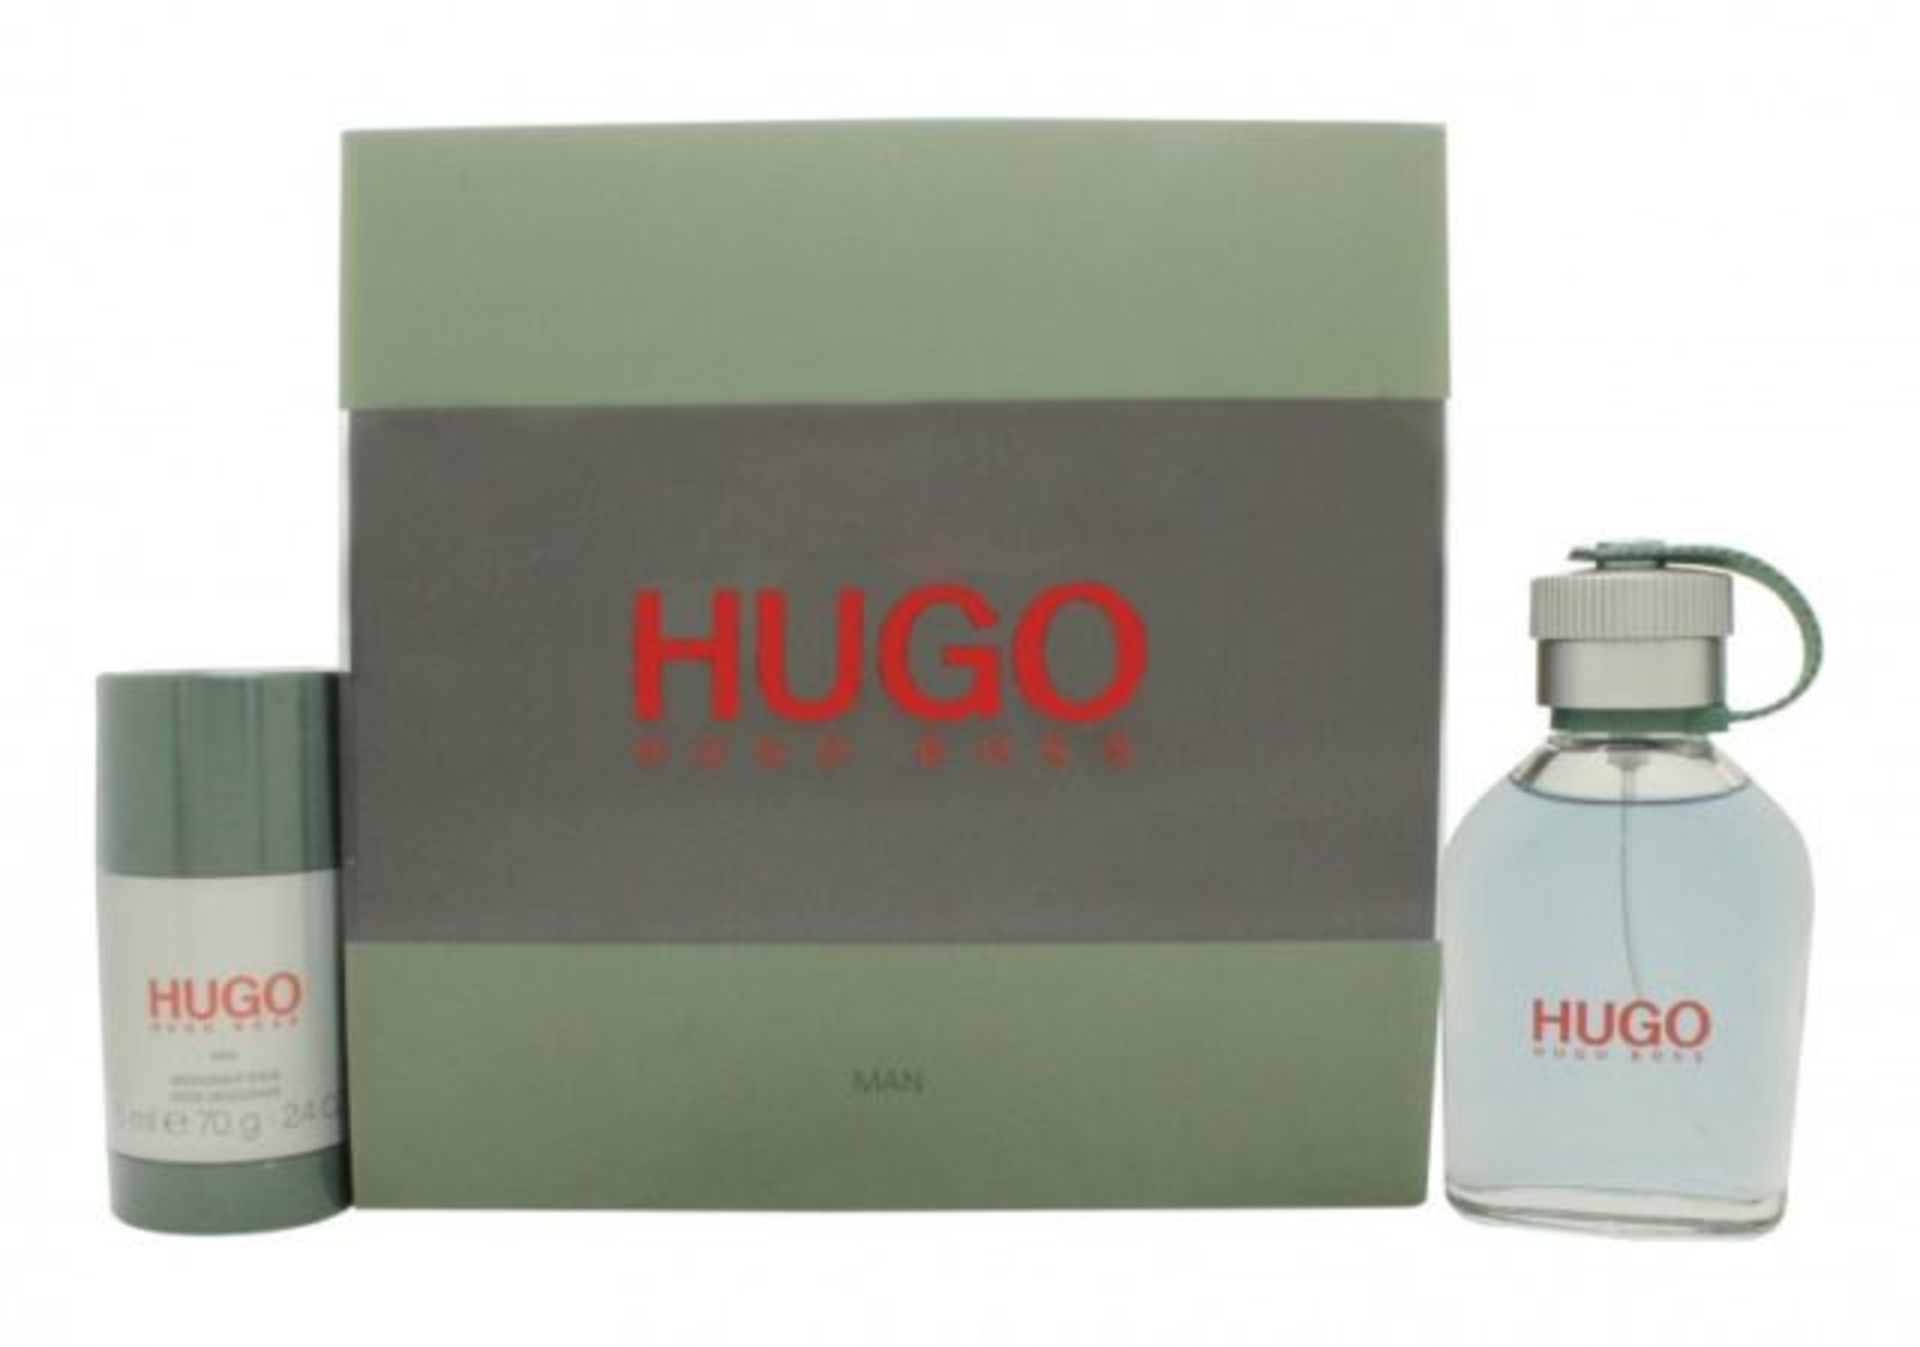 Lot 10106 - V Brand New Gents Hugo Boss Man Gift Set - 75ml Eau De Toilette Spray And Deodorant Stick